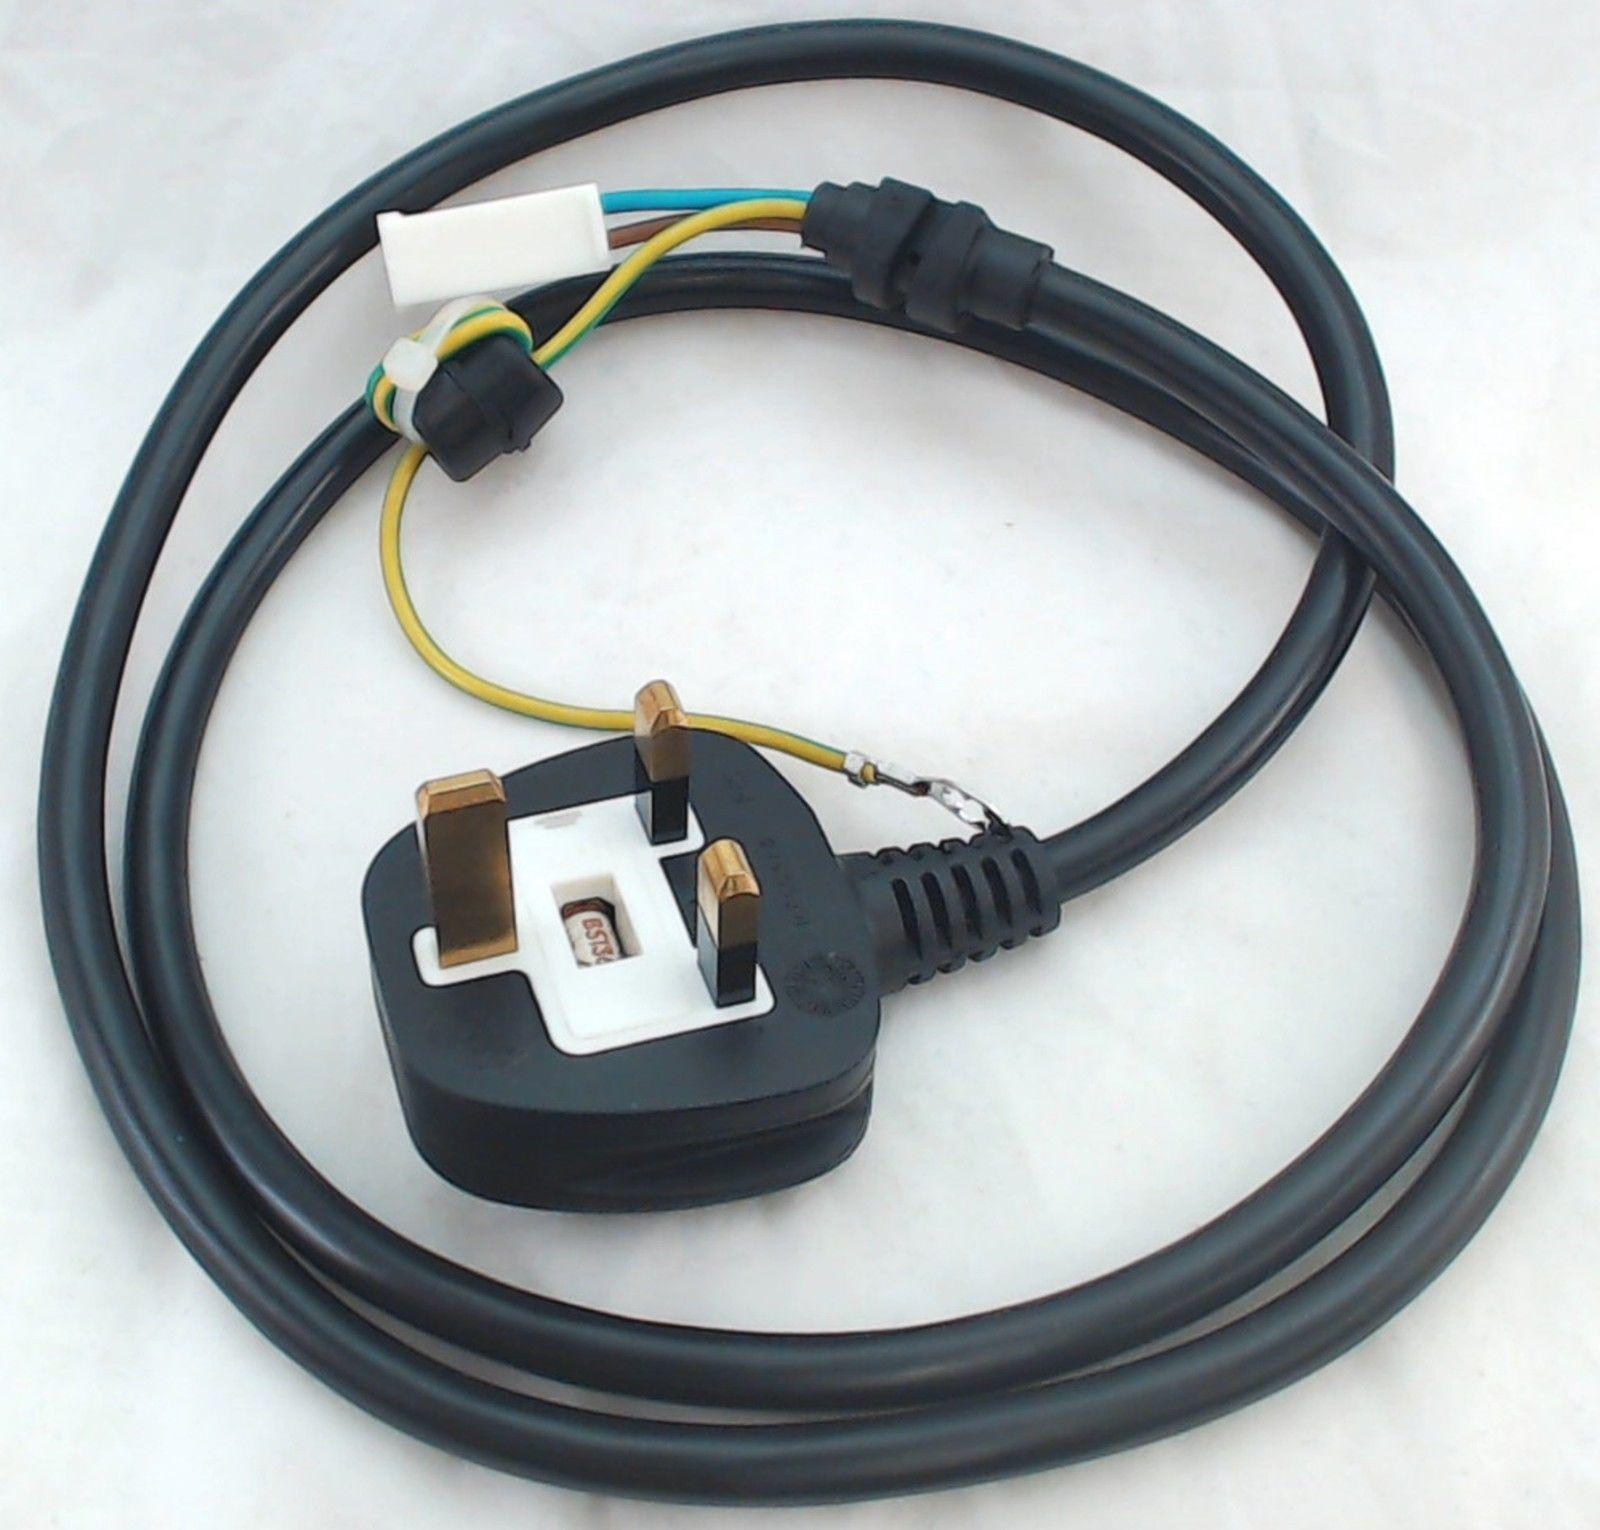 W10419451, Black Power Cord fits Whirlpool KitchenAid Stand Mixer